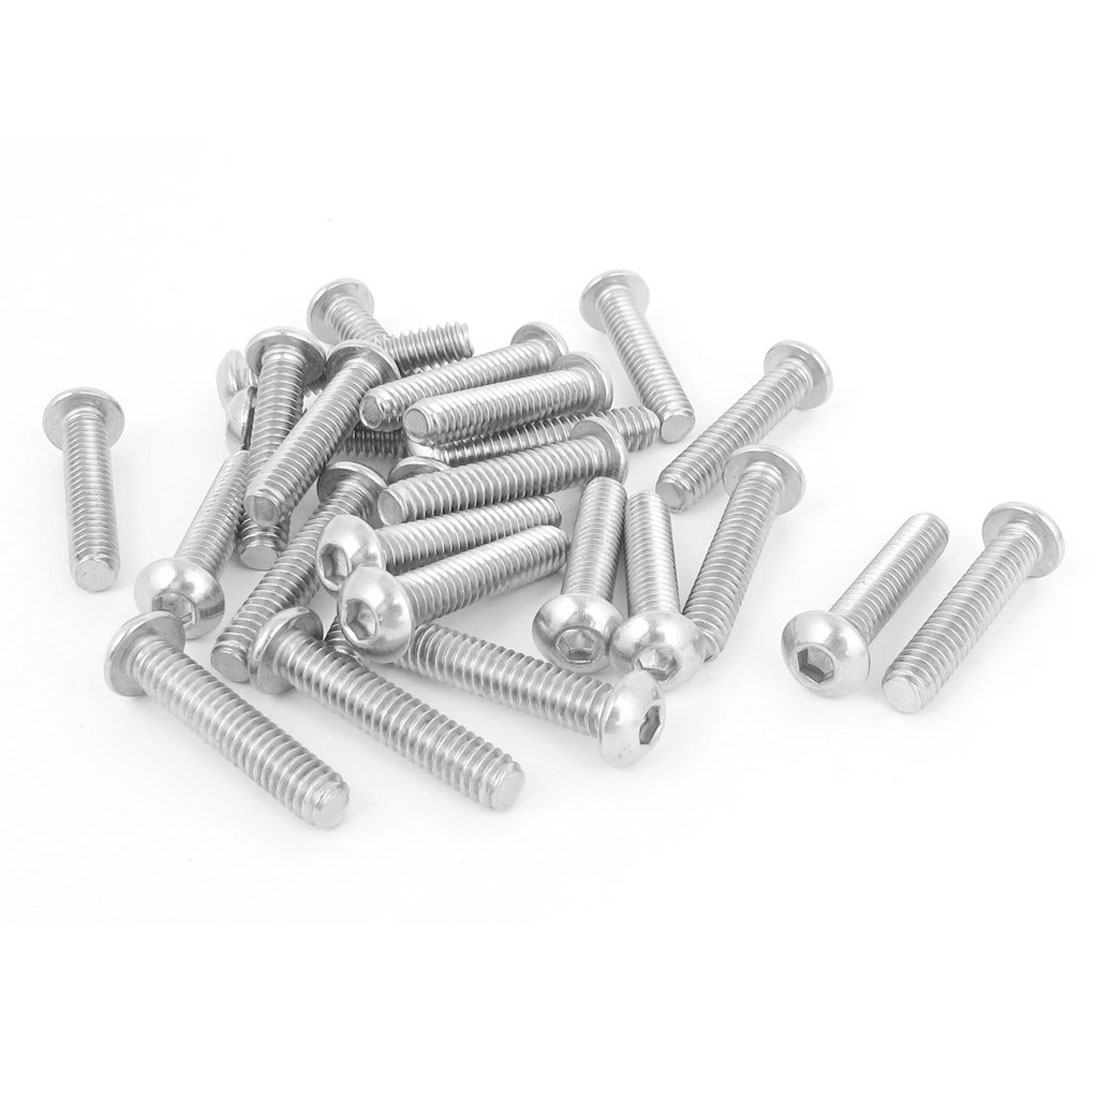 1/4 Inch-20x1-1/4 Inch Hex Socket Button Head Bolts Screws 25pcs 20pcs m3 6 m3 x 6mm aluminum anodized hex socket button head screw